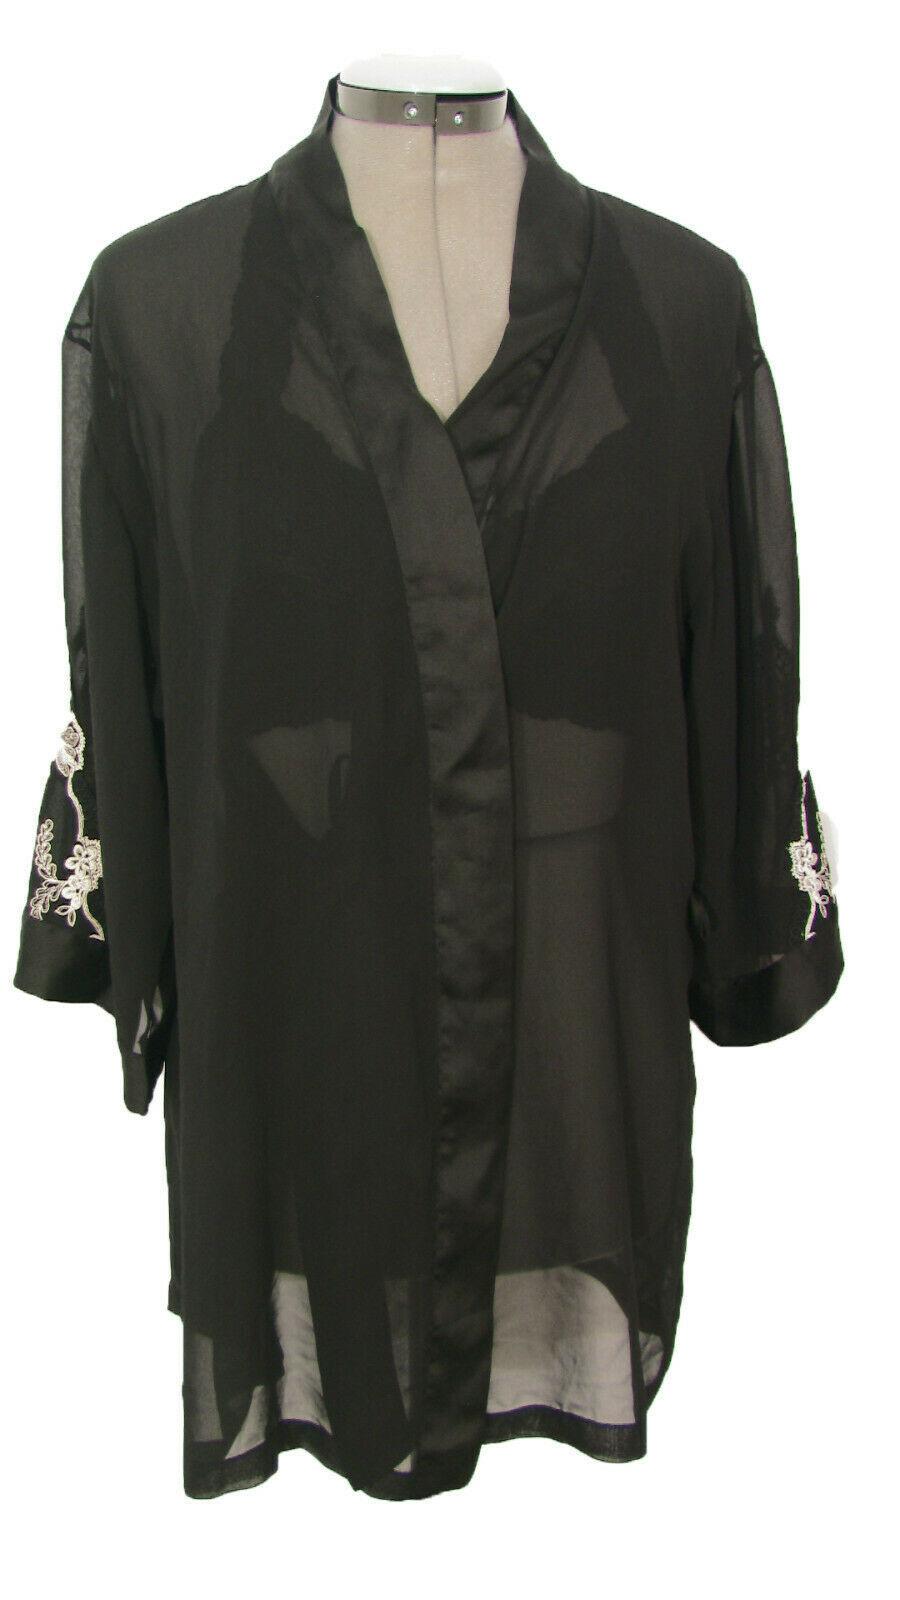 Vera Wang for Fidelia Lingerie Black Chiffon Bed Jacket Size M - $10.00